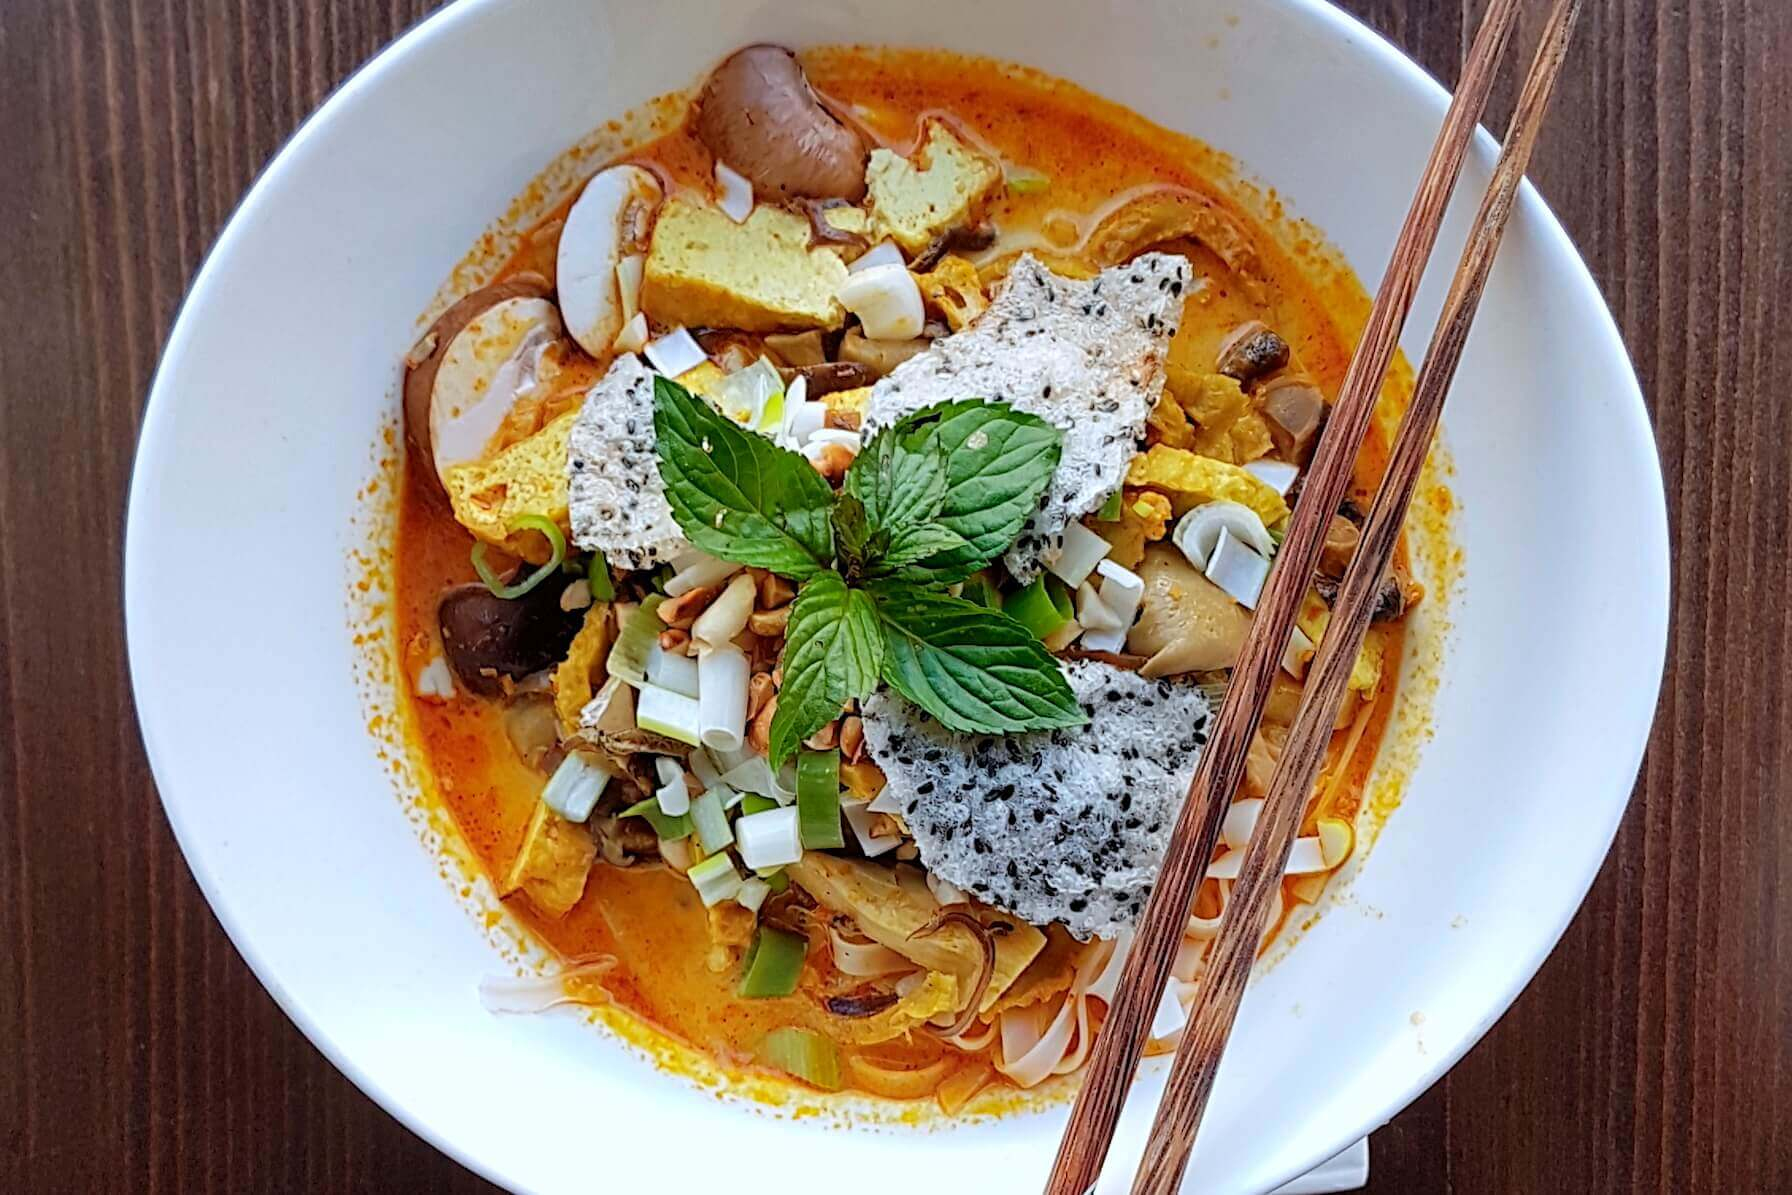 Chay Viet - Vegetarian Vietnamese restaurant in Berlin Mitte